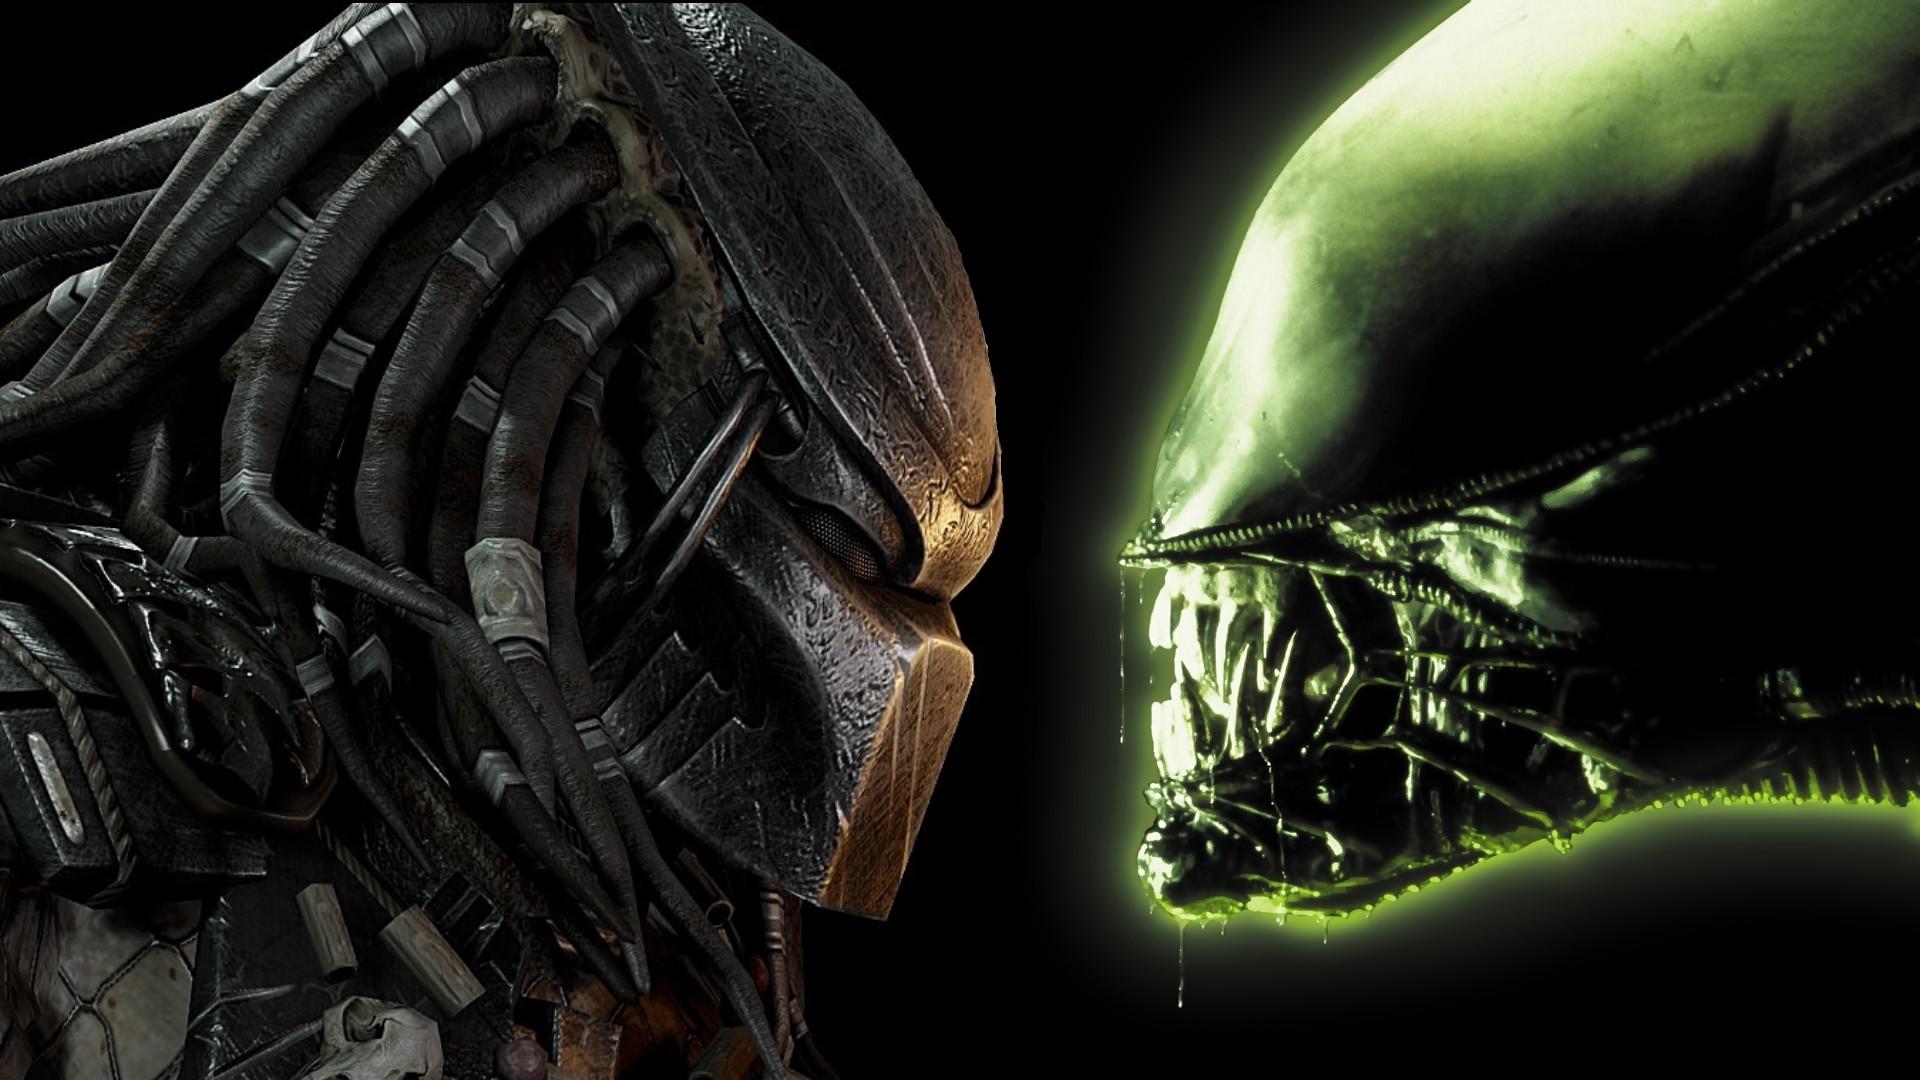 Alien Vs Predator Hd Wallpapers: Alien Vs Predator Wallpaper ·① WallpaperTag